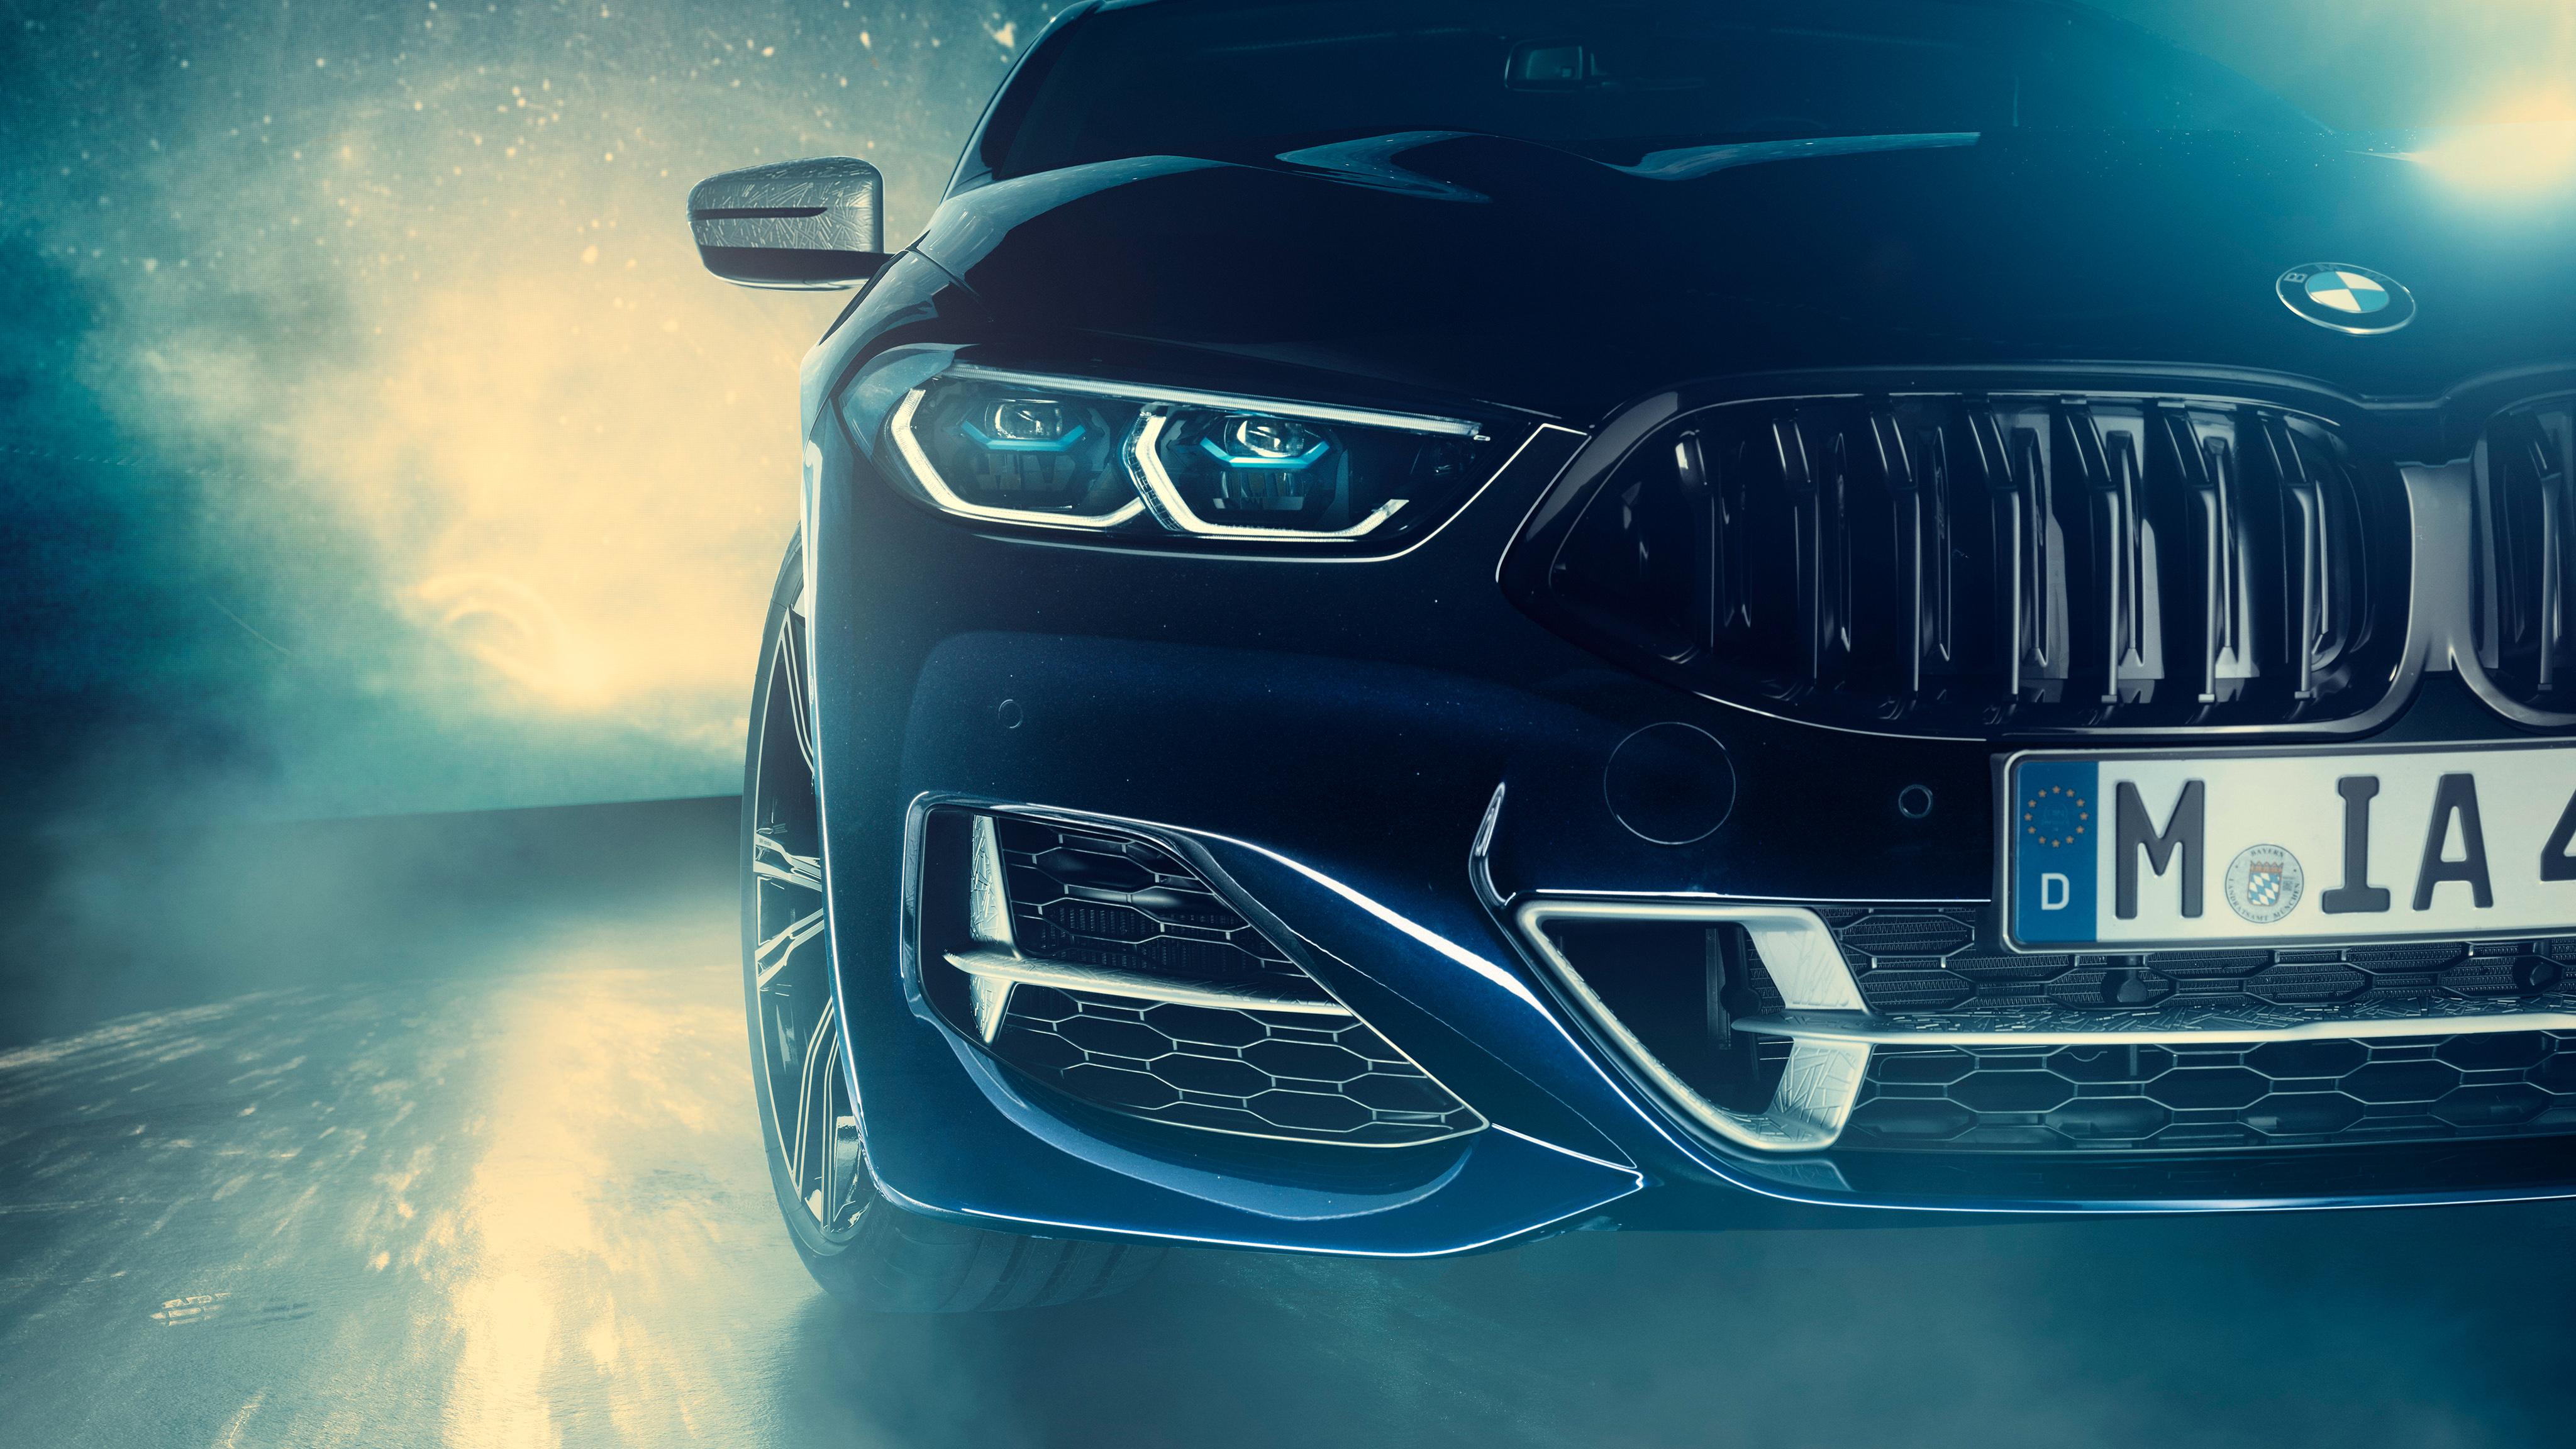 Bmw Individual M850i Xdrive Night Sky 2019 4k Wallpaper Hd Car